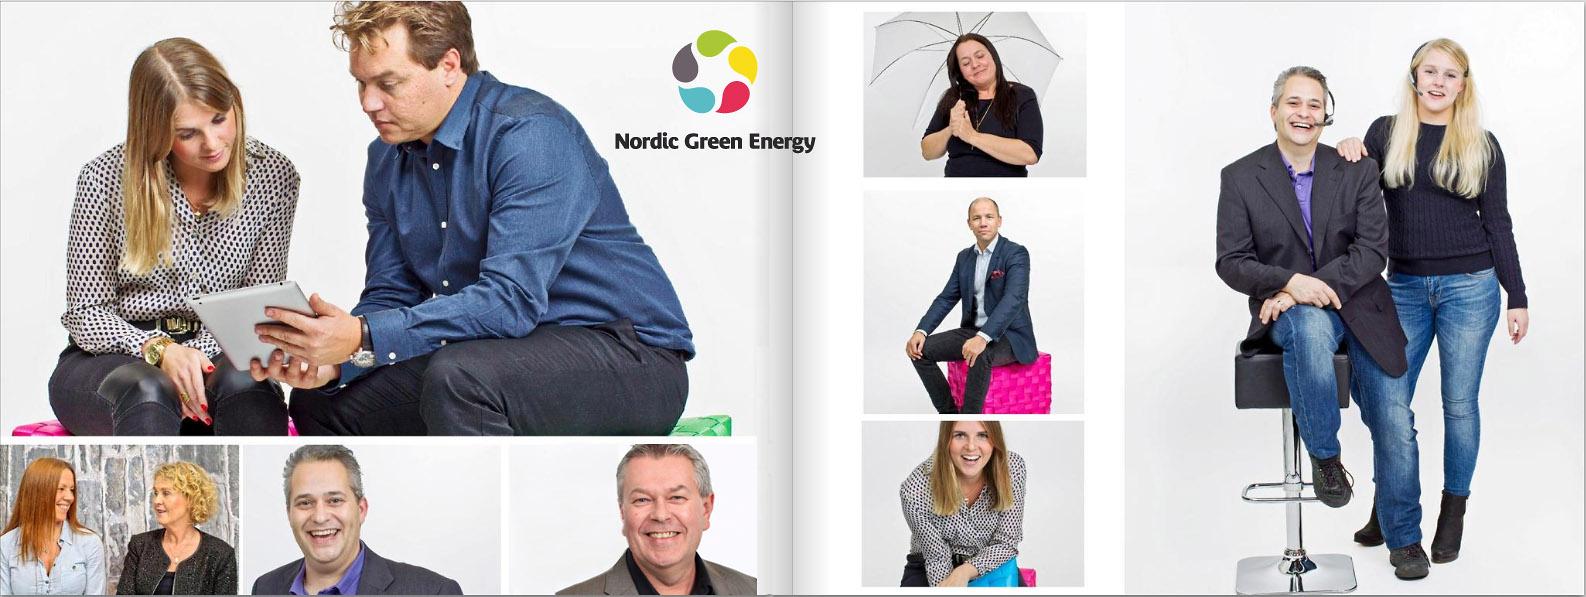 Henrik Sellin fotograf i Stockholm tar bilder åt Nordic Green Energy.